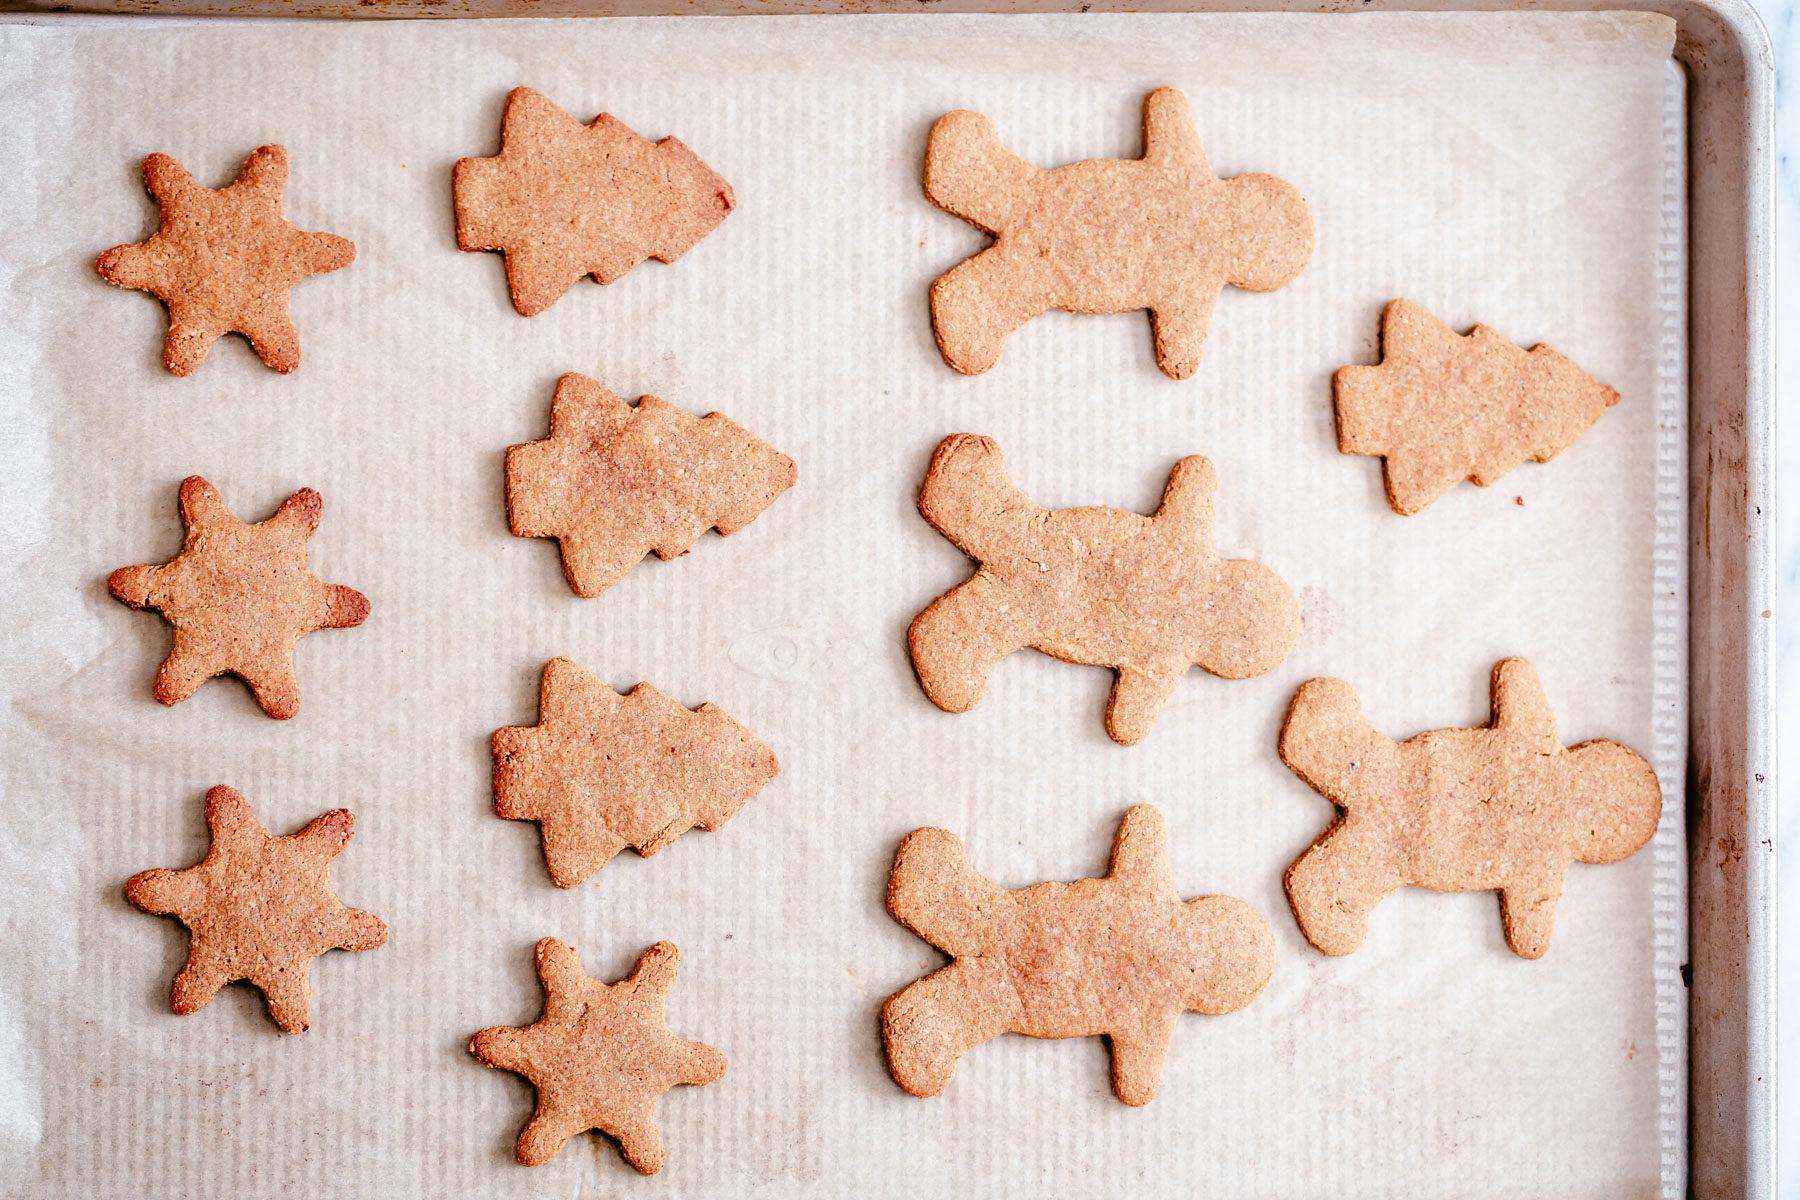 baked vegan gingerbread cookies on a cookie sheet